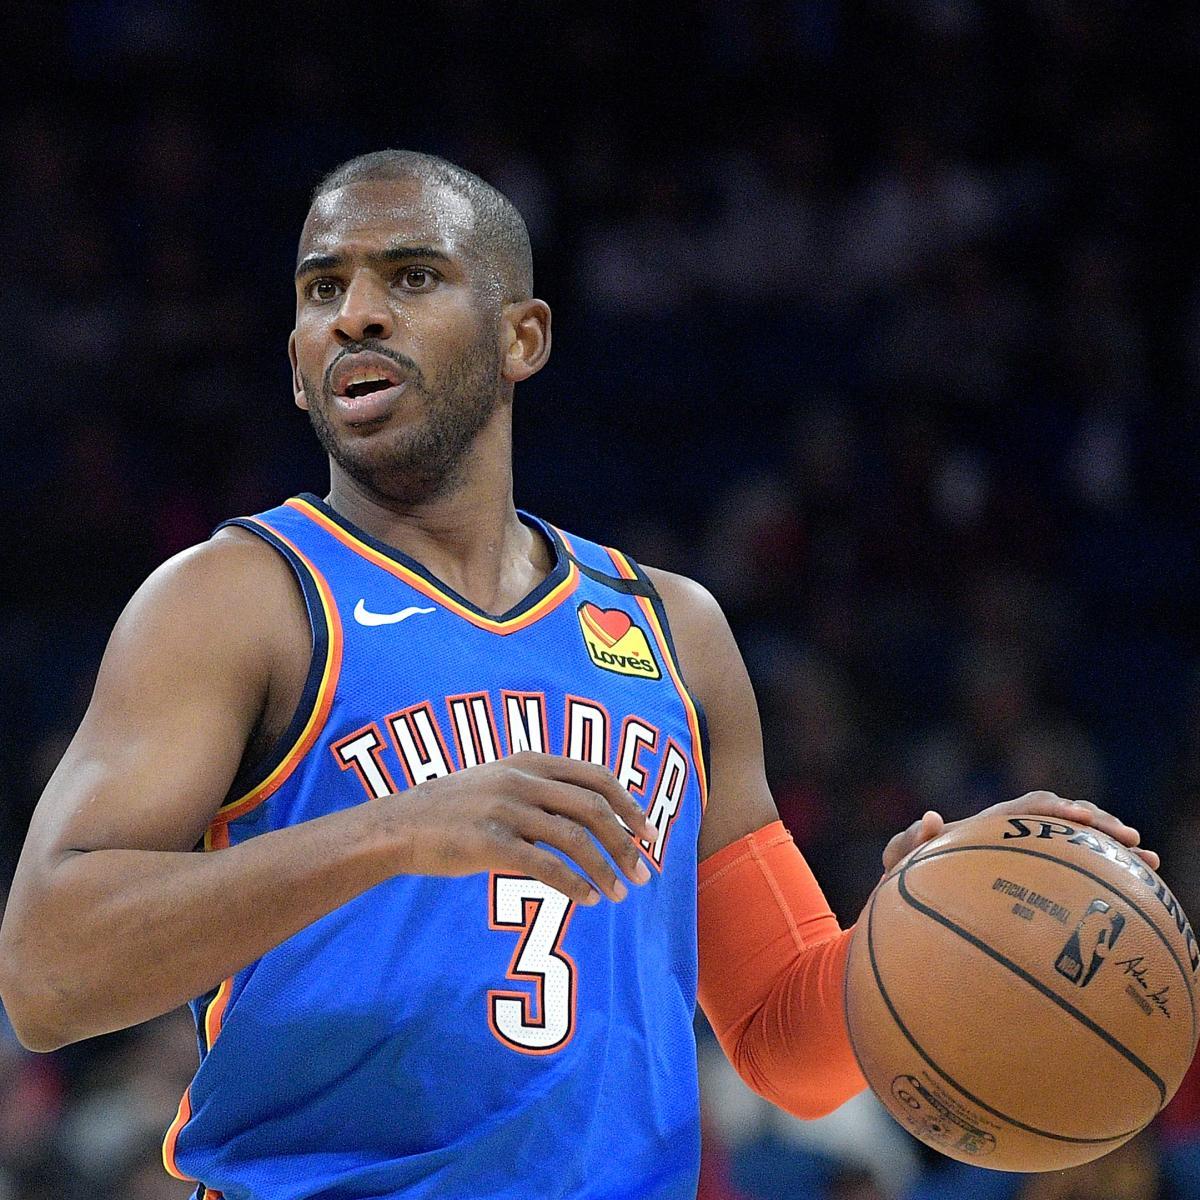 Knicks Trade Rumors: NY Gathering Chris Paul Intel for Possible Offseason Move